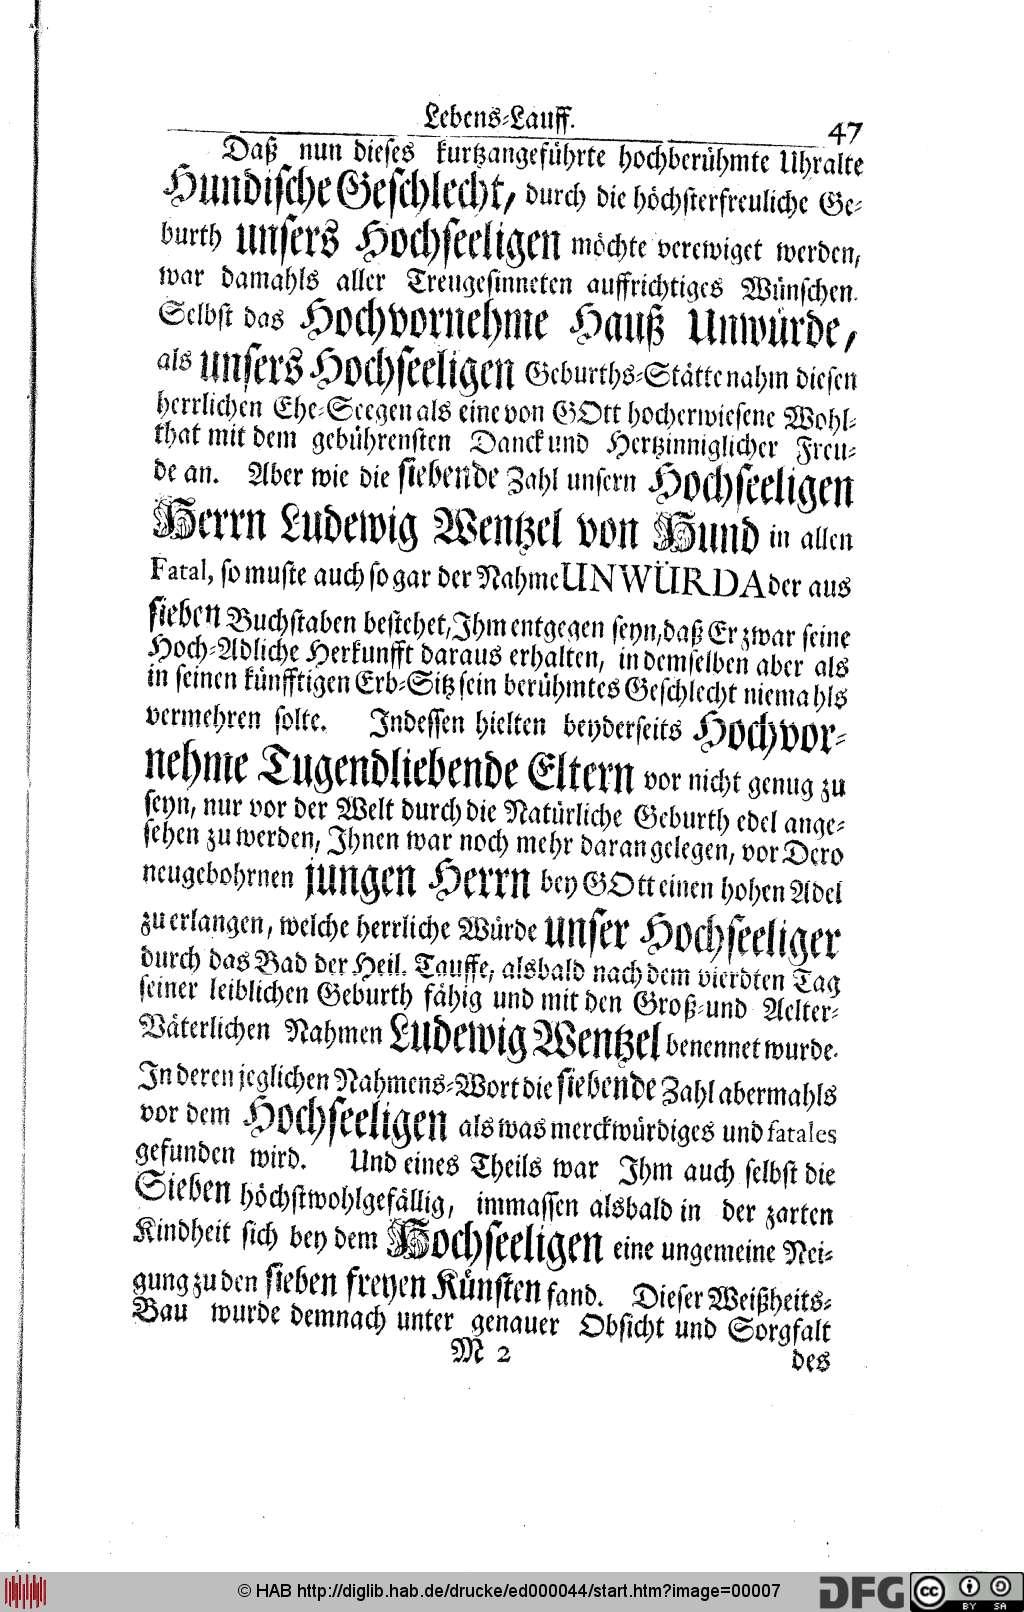 http://diglib.hab.de/drucke/ed000044/00007.jpg